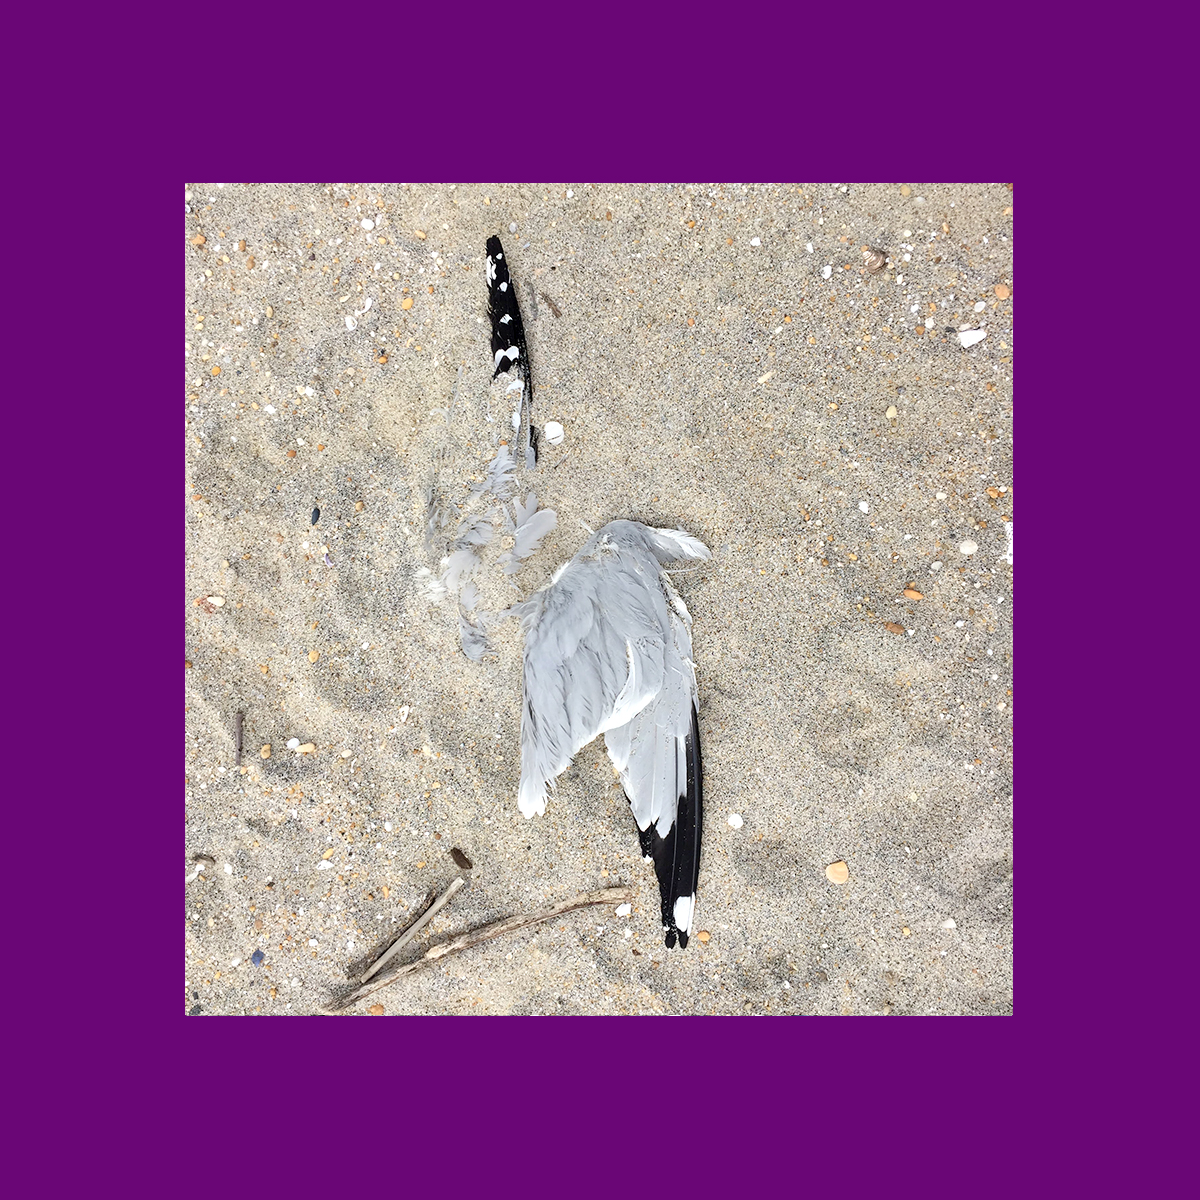 amy_chen_design_surfrider_asbury_park_new_jersey_beach_clean_dead_seagull.jpg